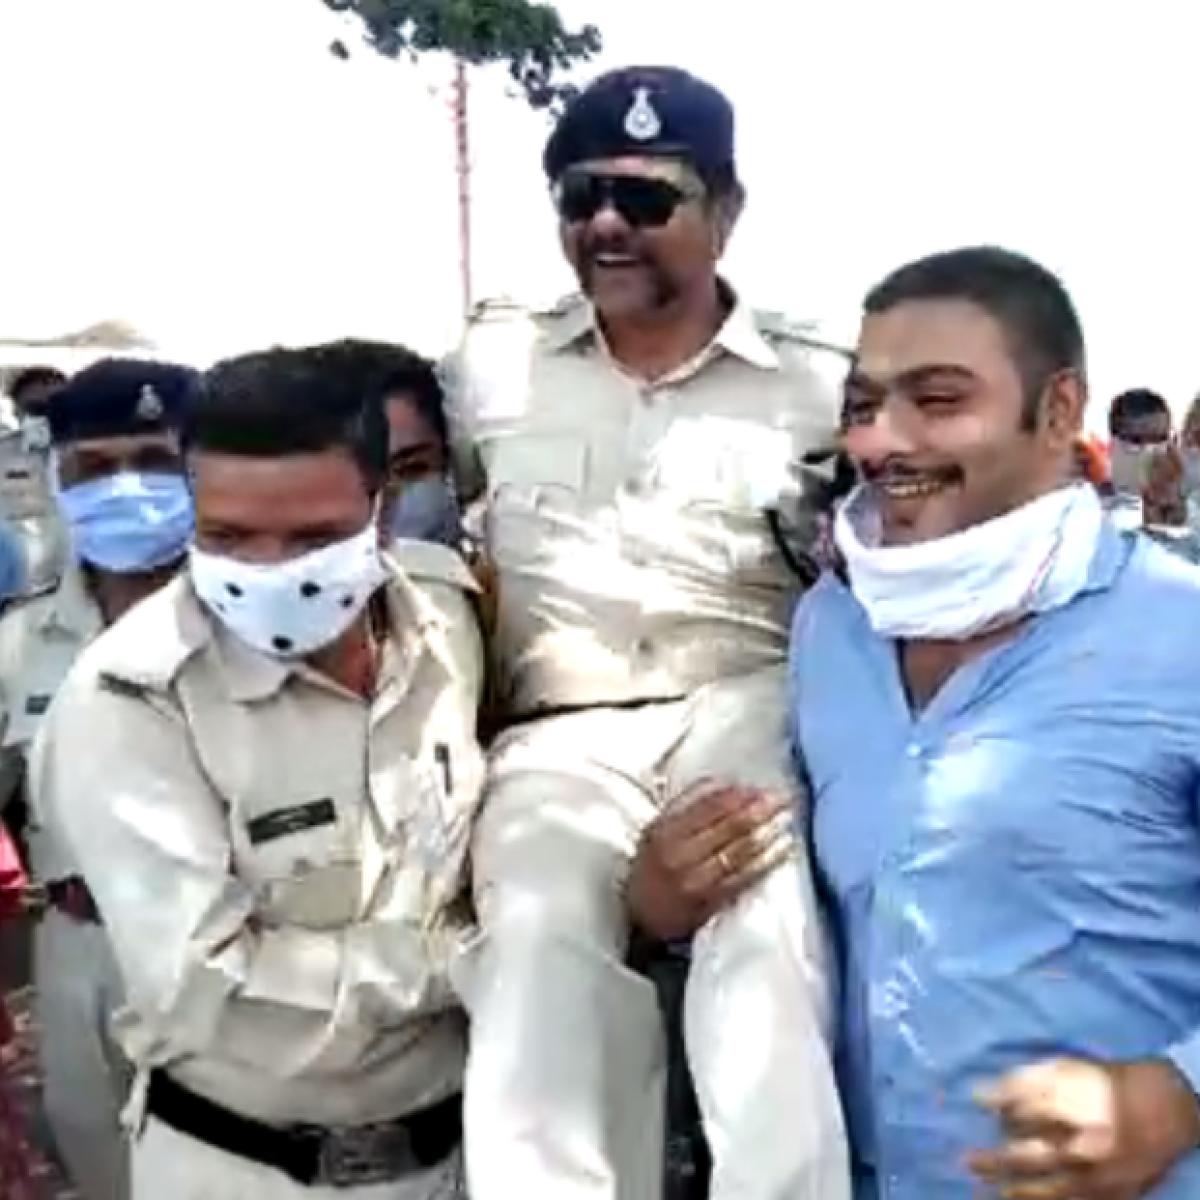 Madhya Pradesh: Emotional cops make merry, stomp on corona rules